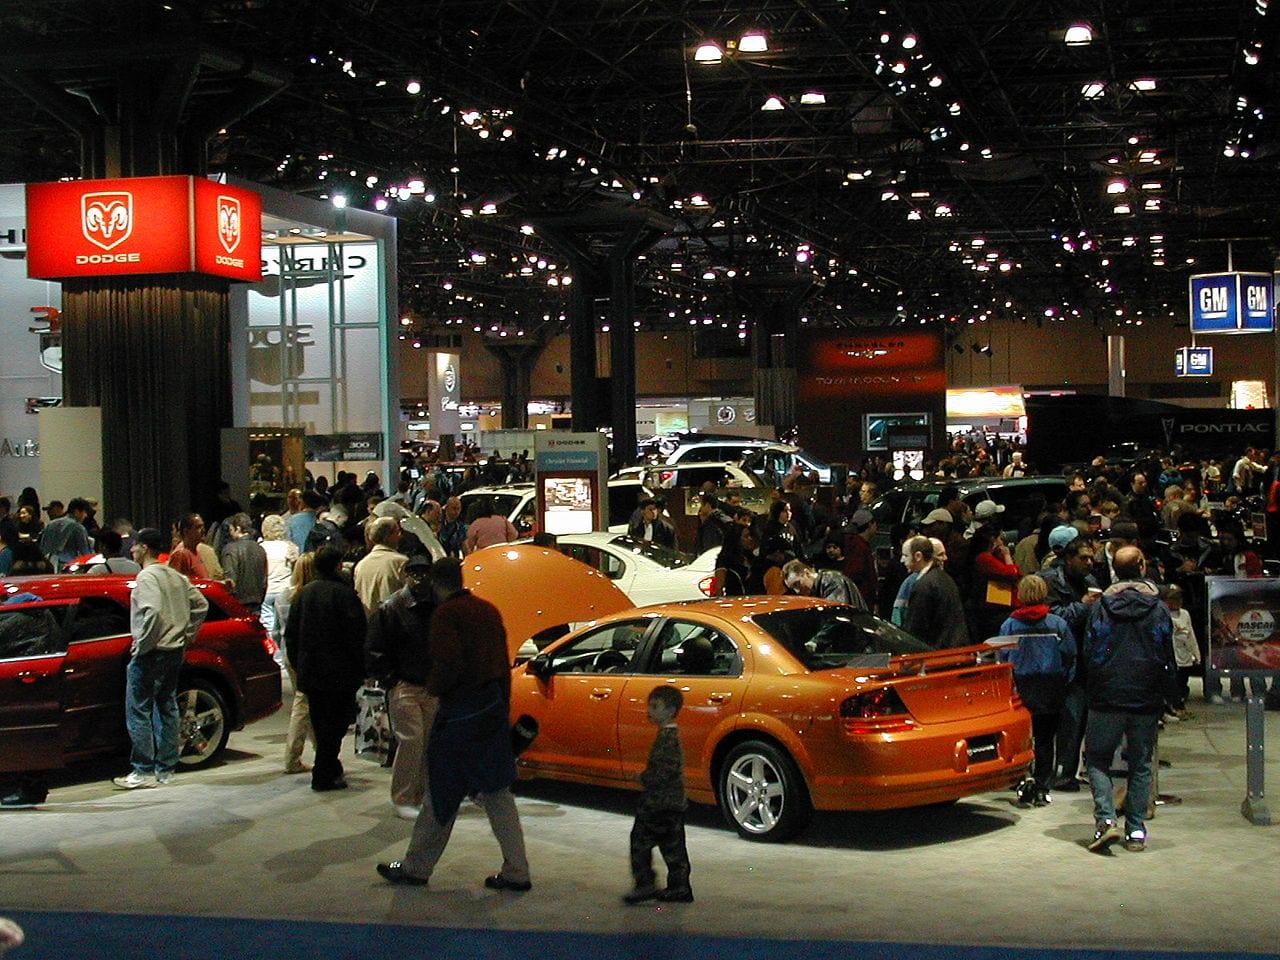 New York International Auto Show Javits Center PlatoPost News - Nyc car show javits center